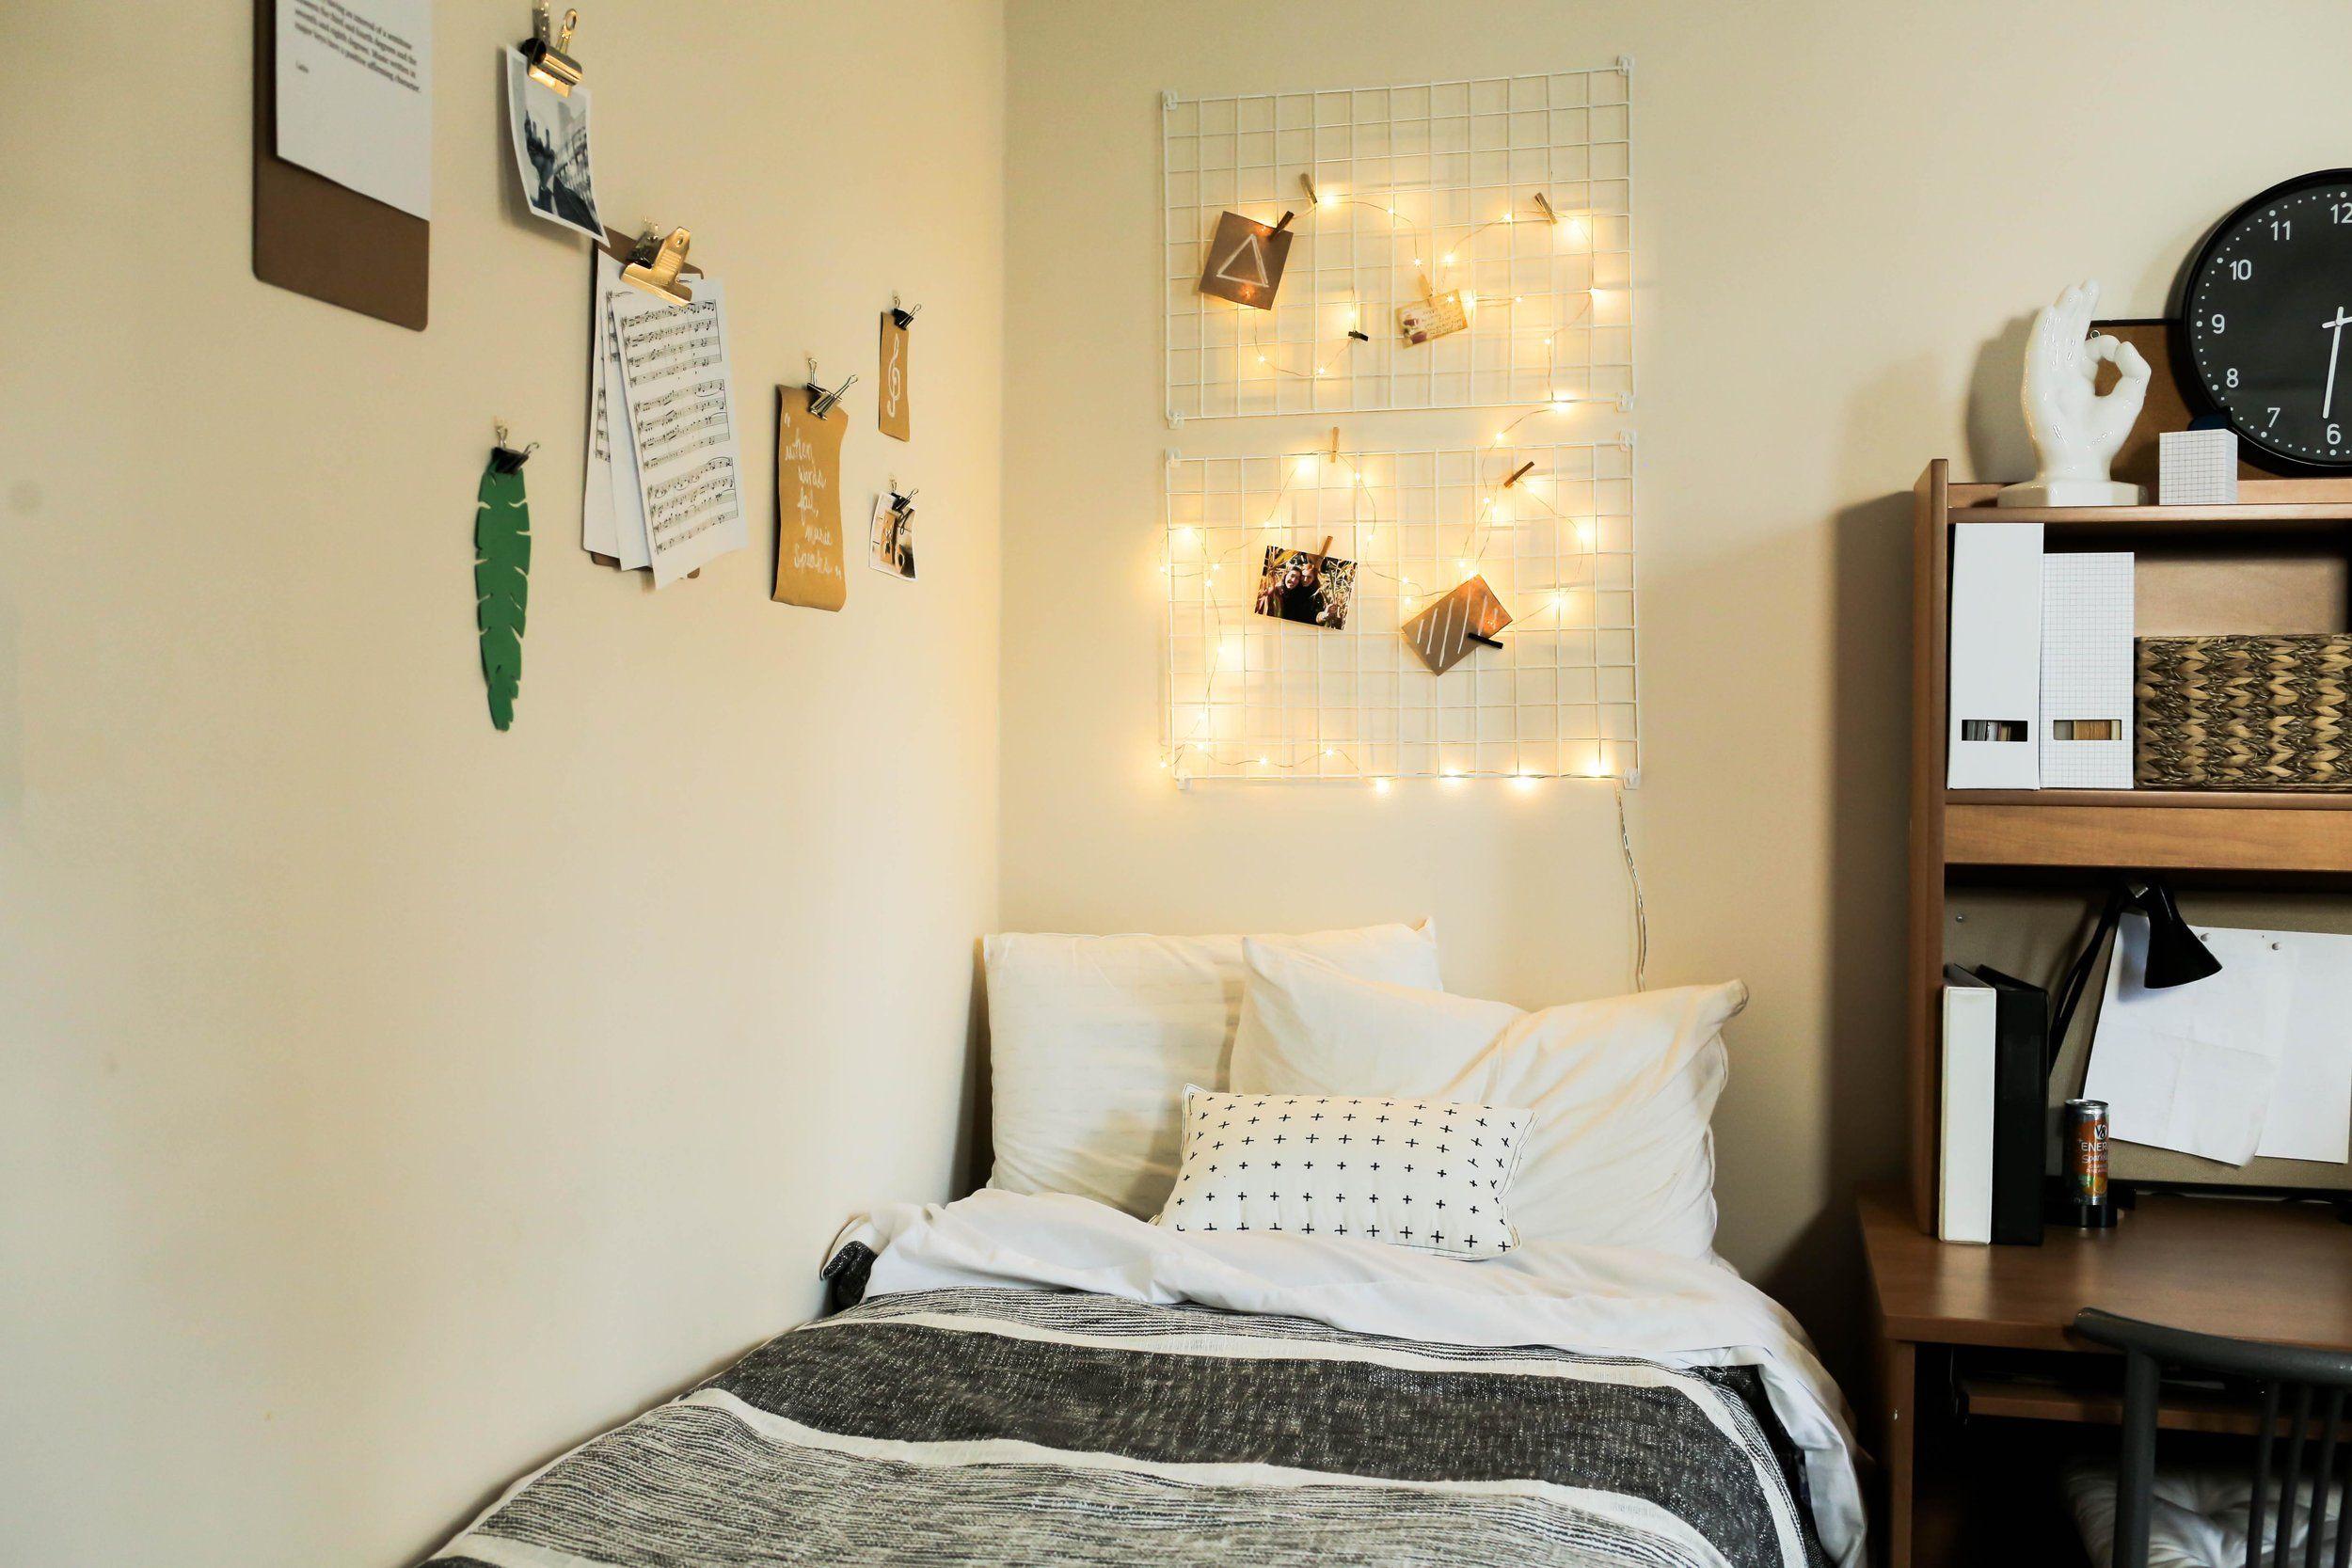 Dorm_Edited.jpg | dorm room | Pinterest | Minimalist dorm, Dorm and ...